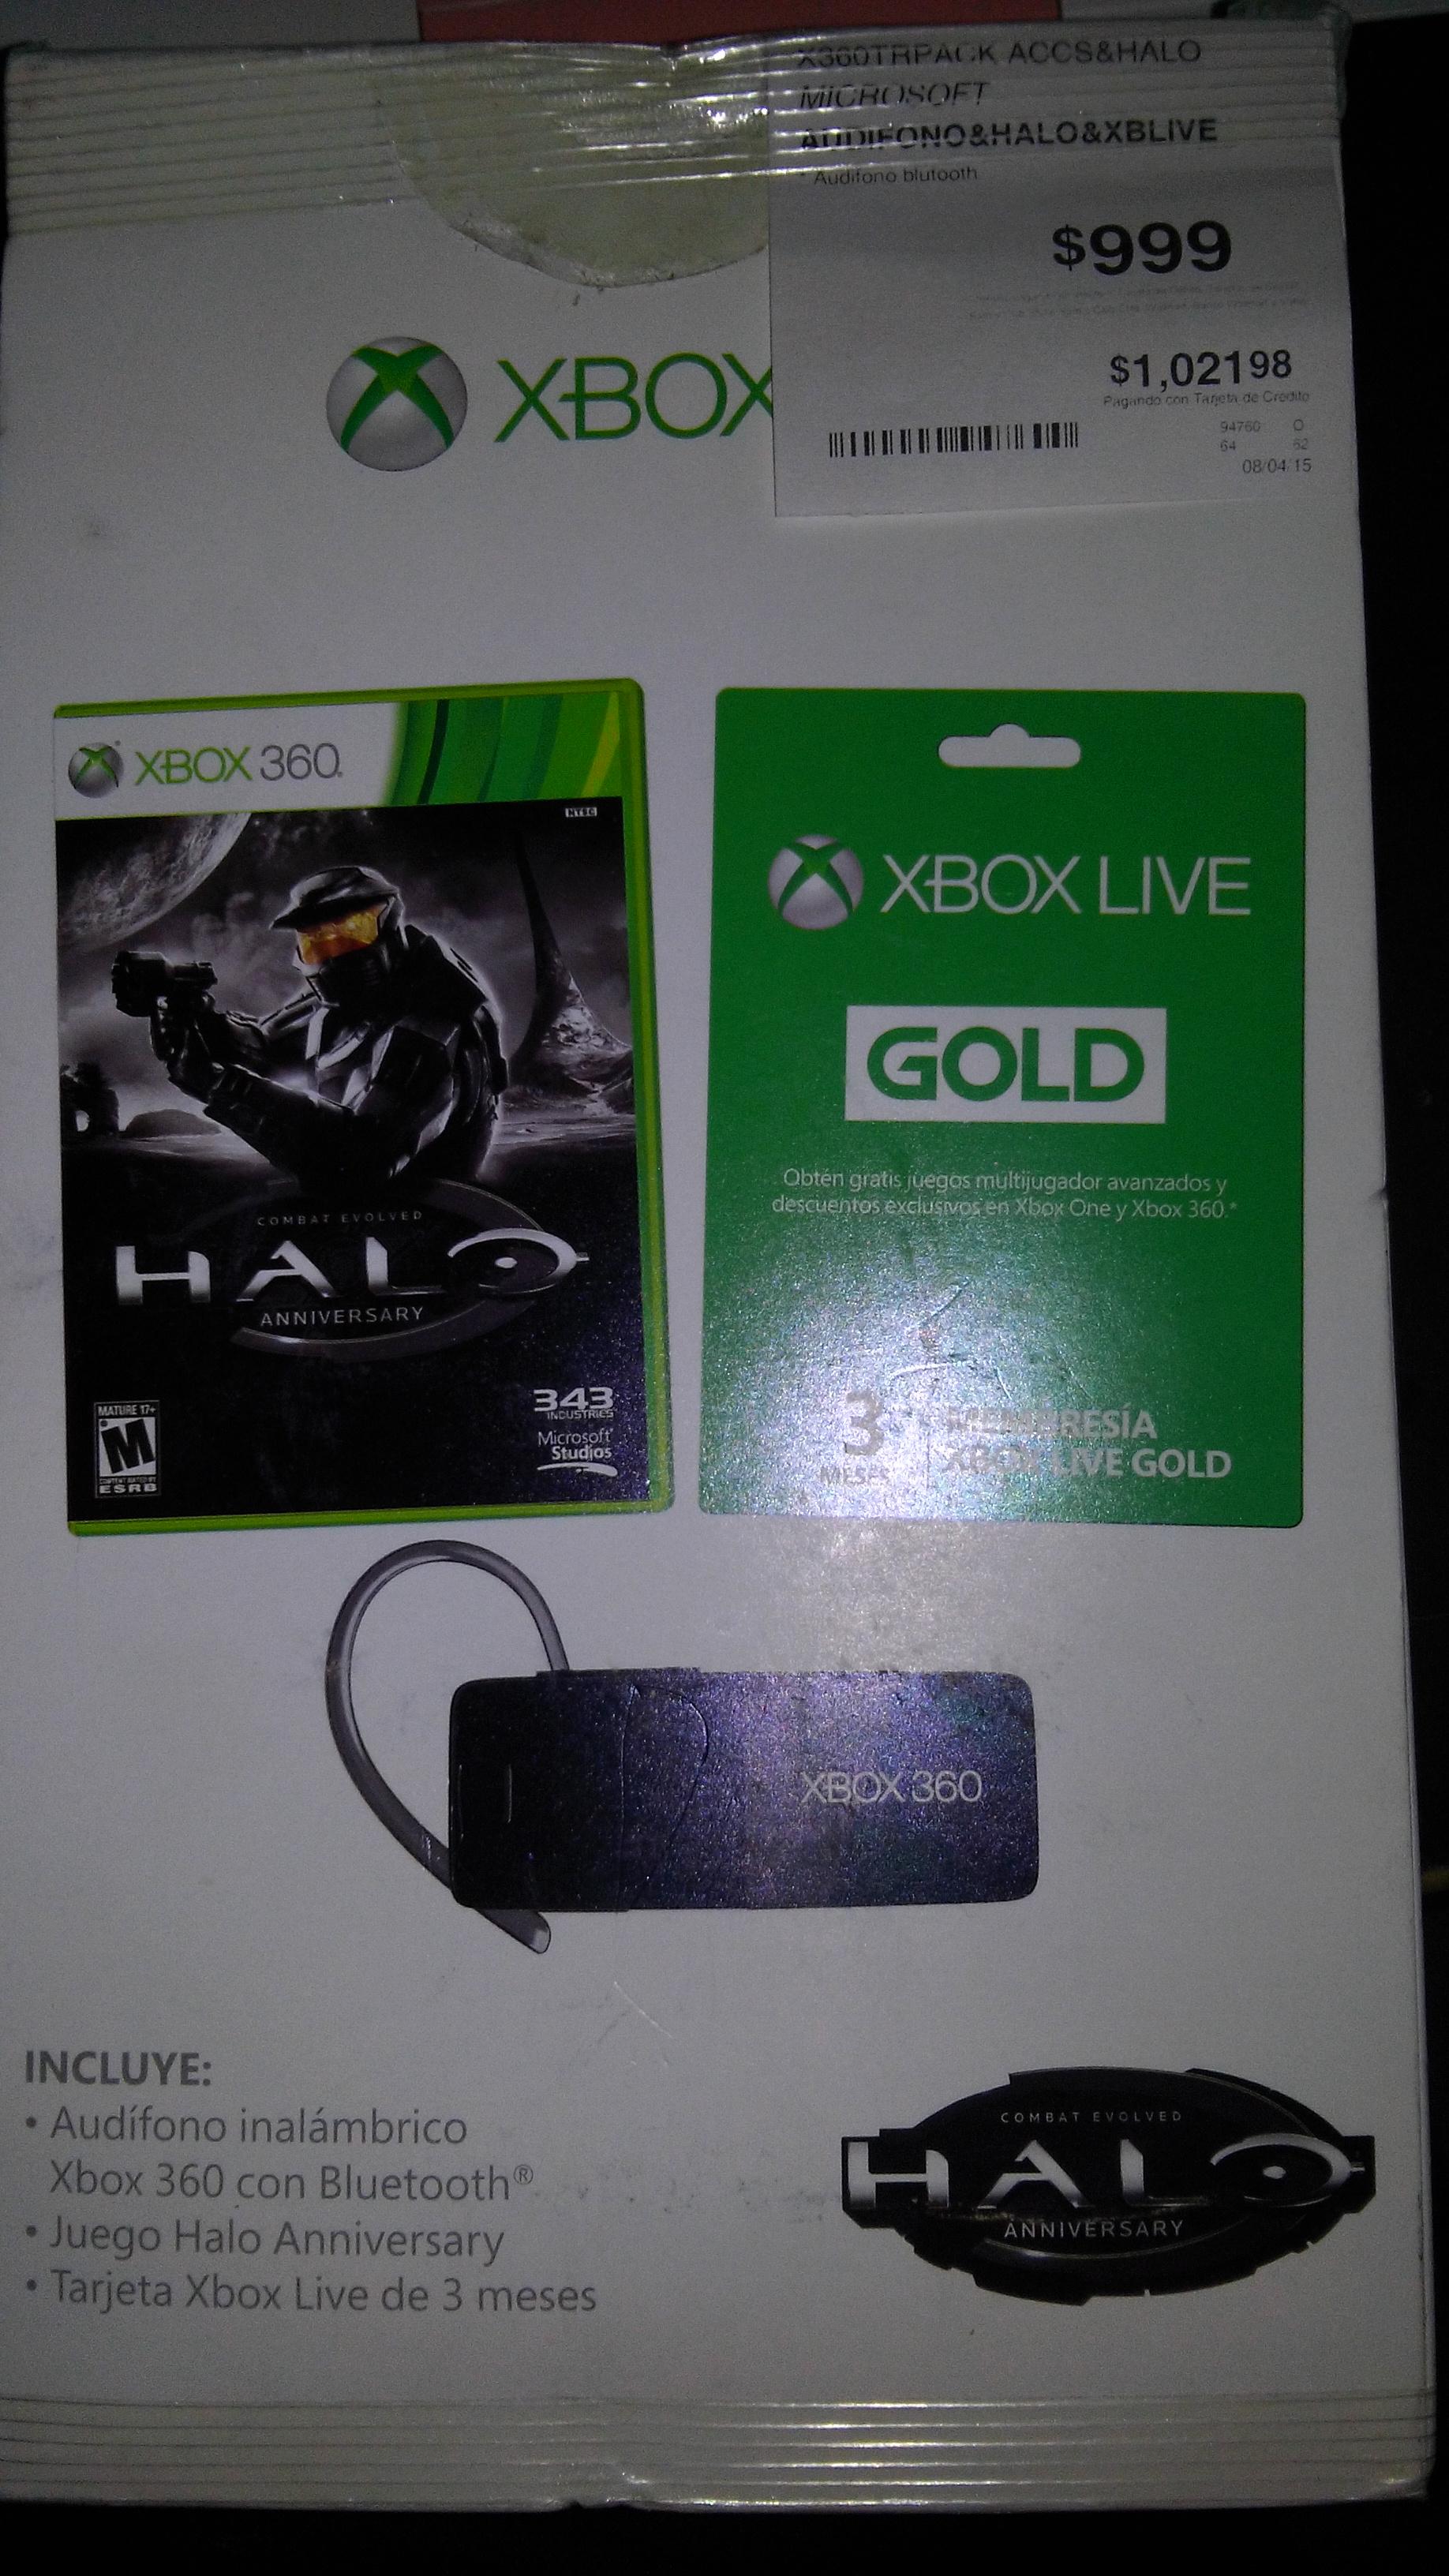 Kit para Xbox 360 con Audifono inalmbrico, juego halo Anniversary y tarjeta xbox live 3 mese